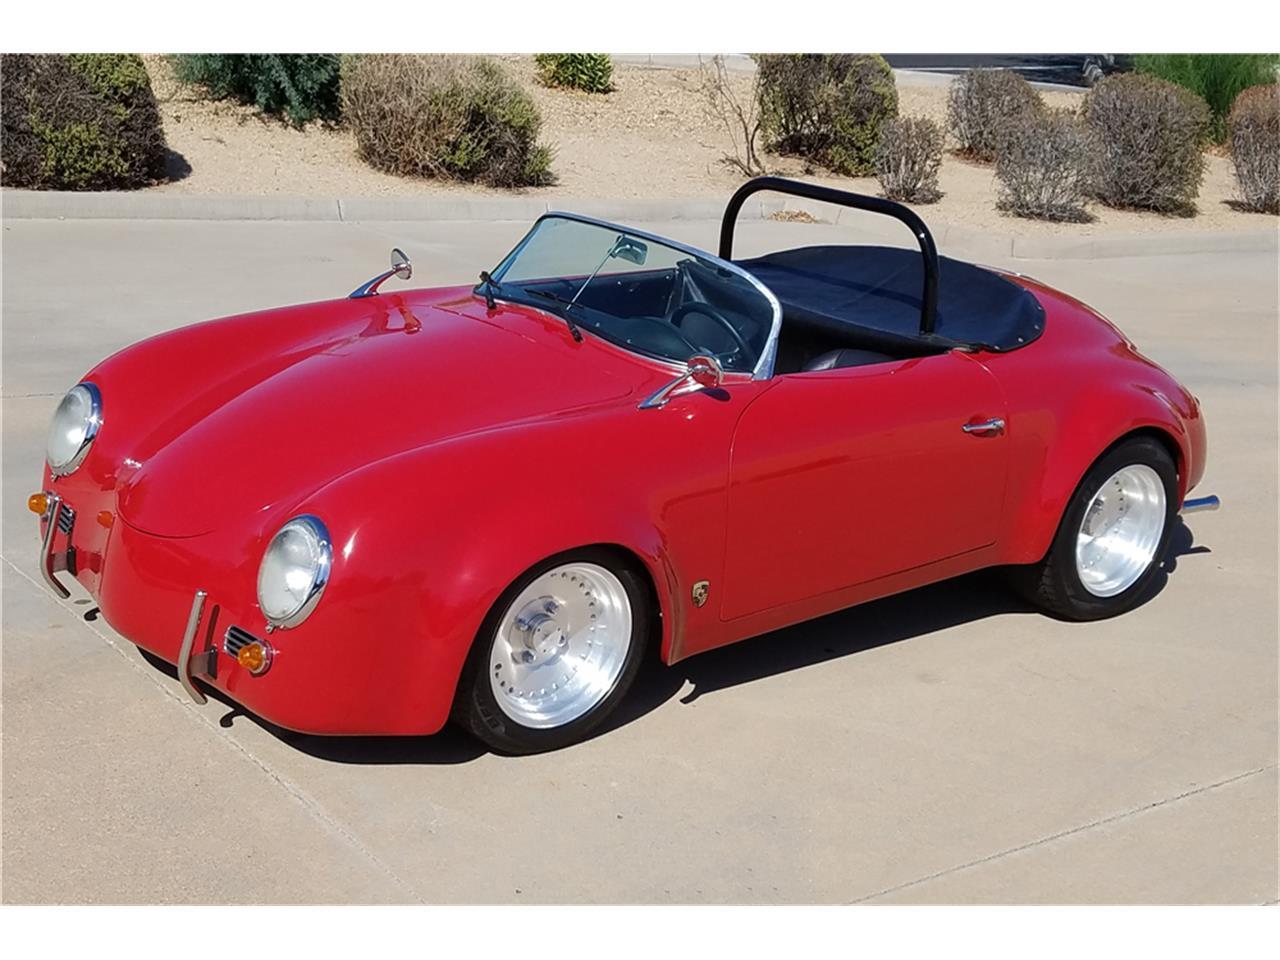 hight resolution of  speedster 1955 porsche 356 for sale cliccars com cc 1025732 on 1954 porsche kroon wire